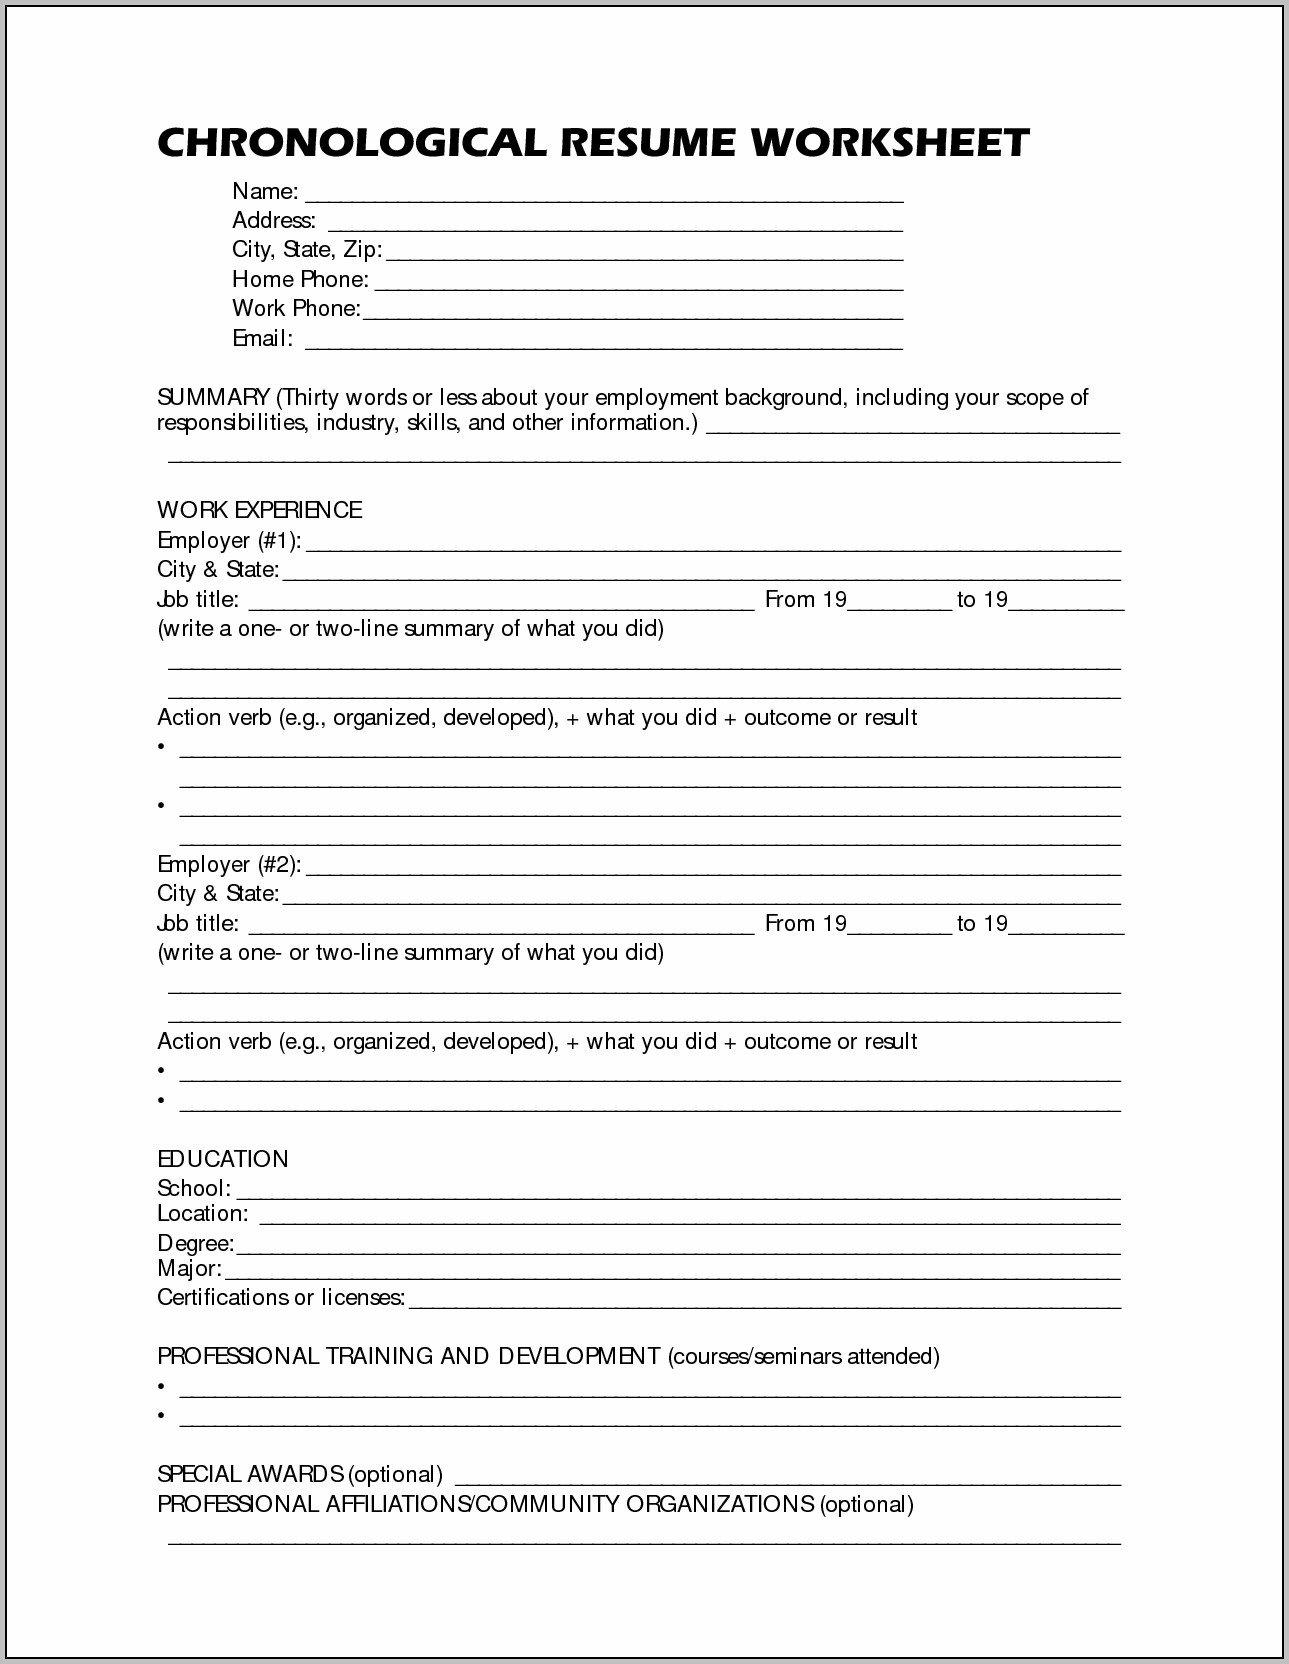 Free Printable Resume Worksheet  Shop Fresh Regarding Resume Worksheet For Adults